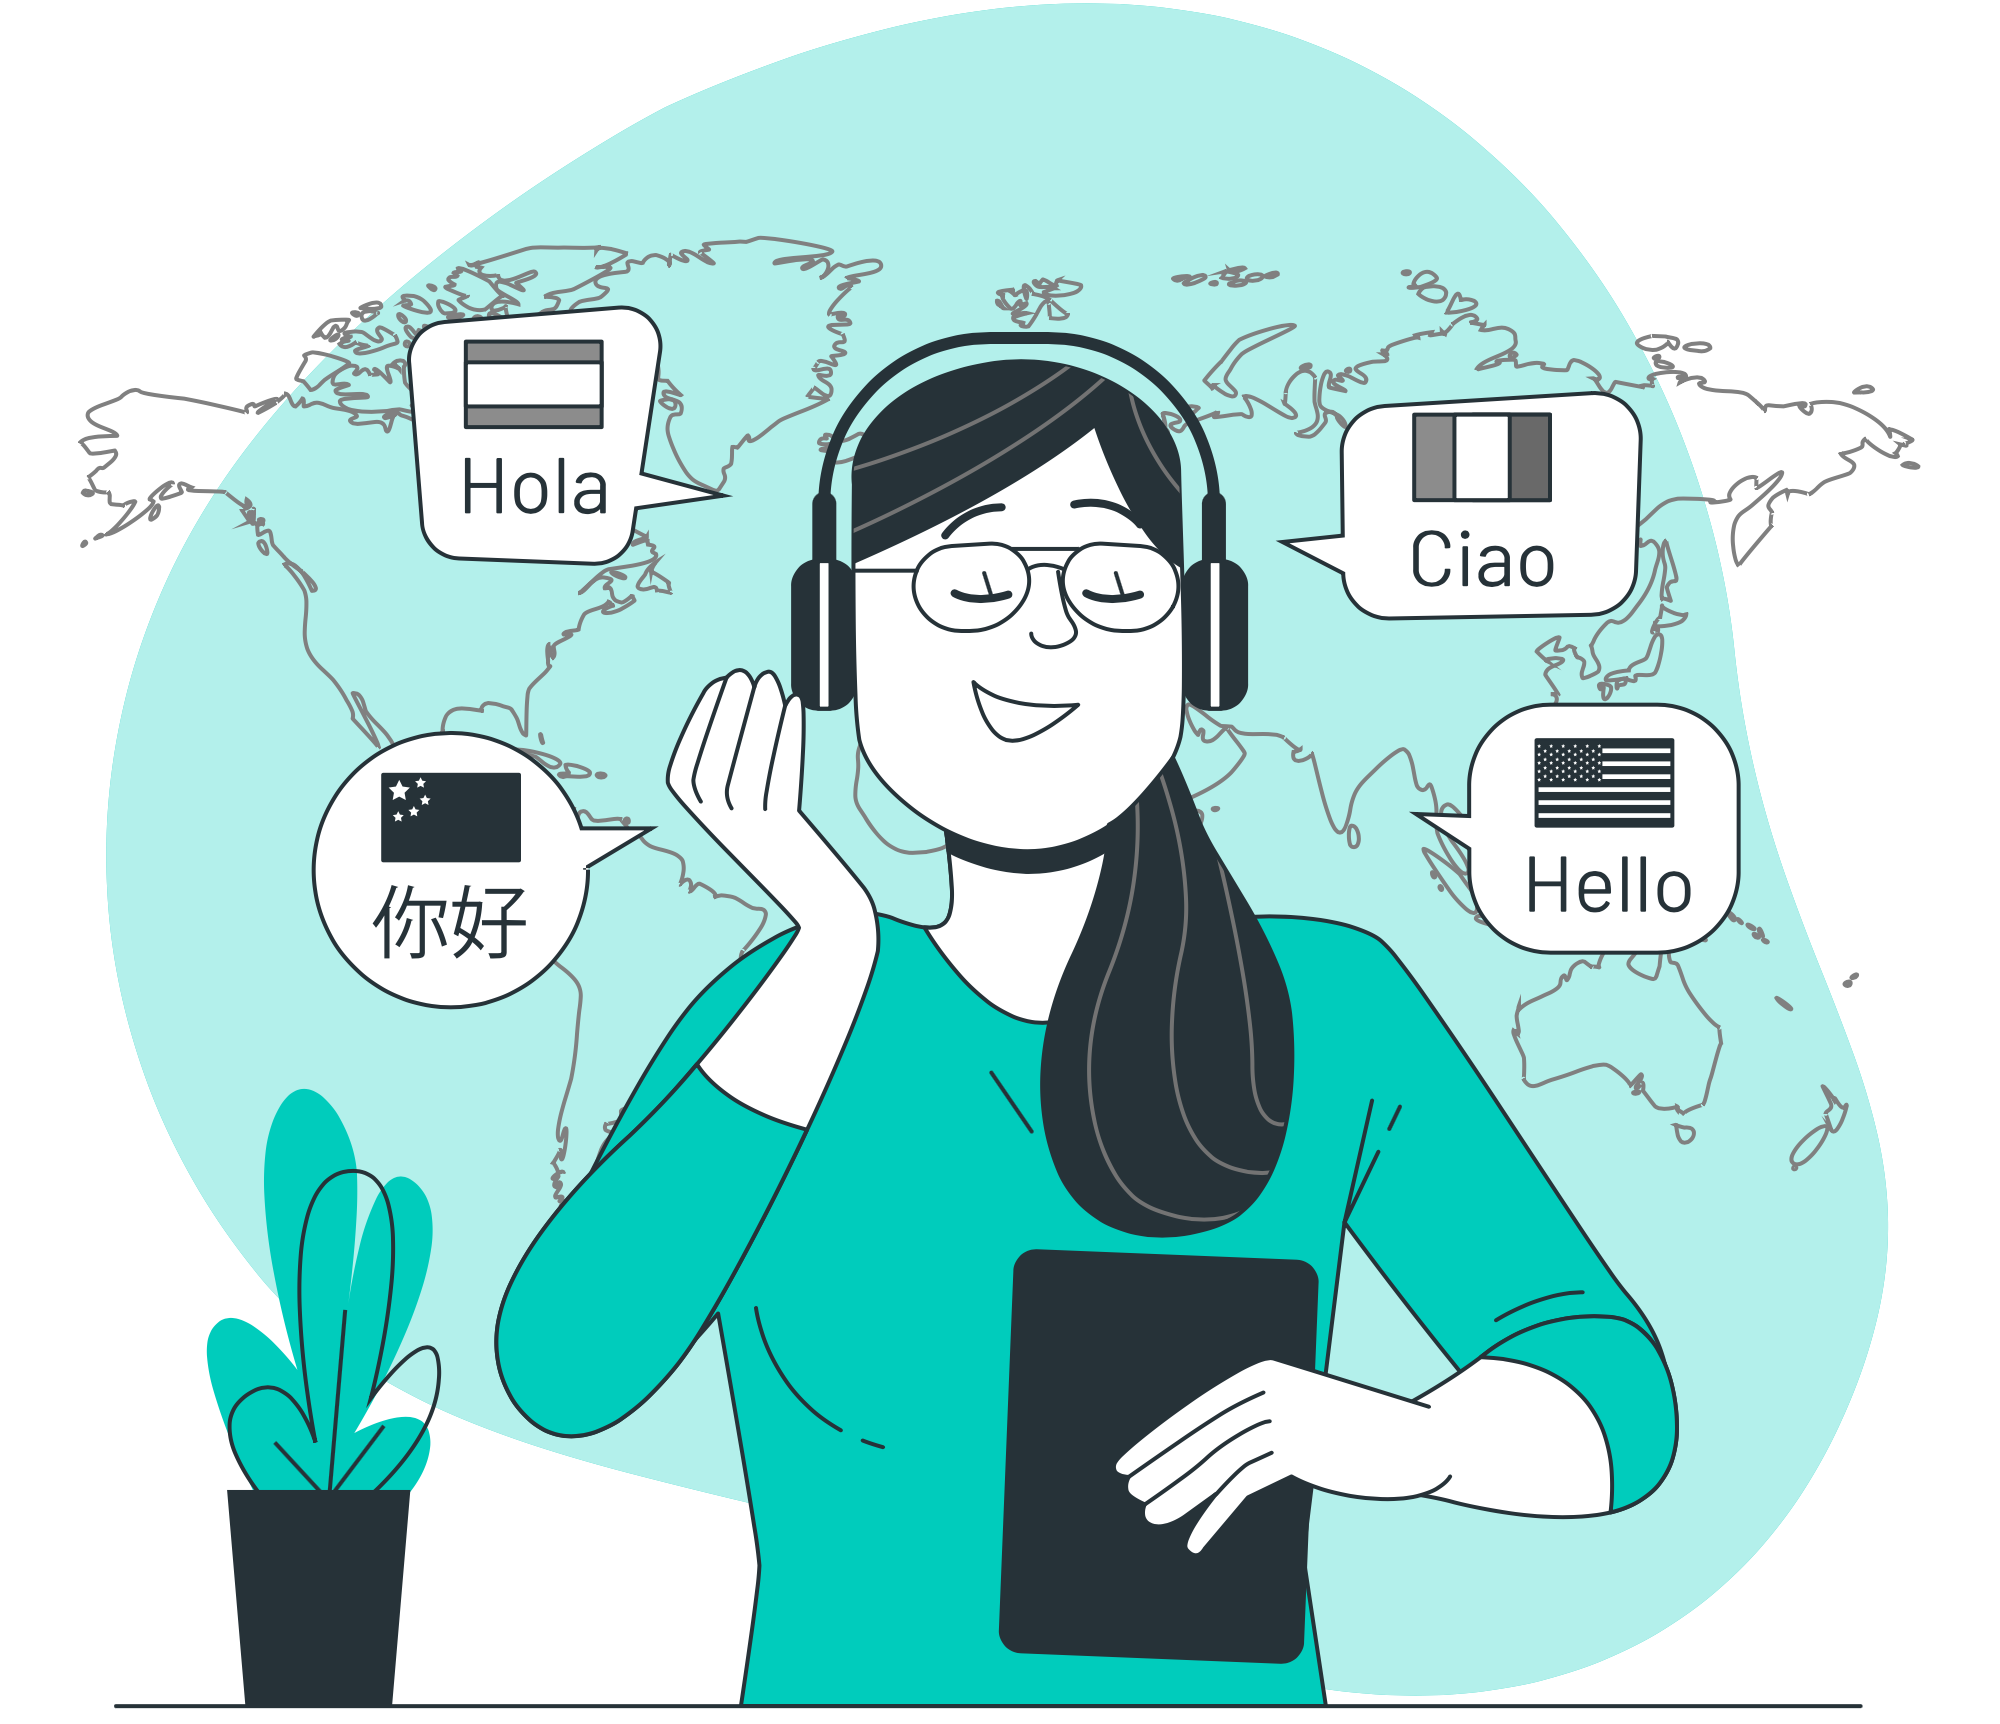 Clases de inglés online por videollamada